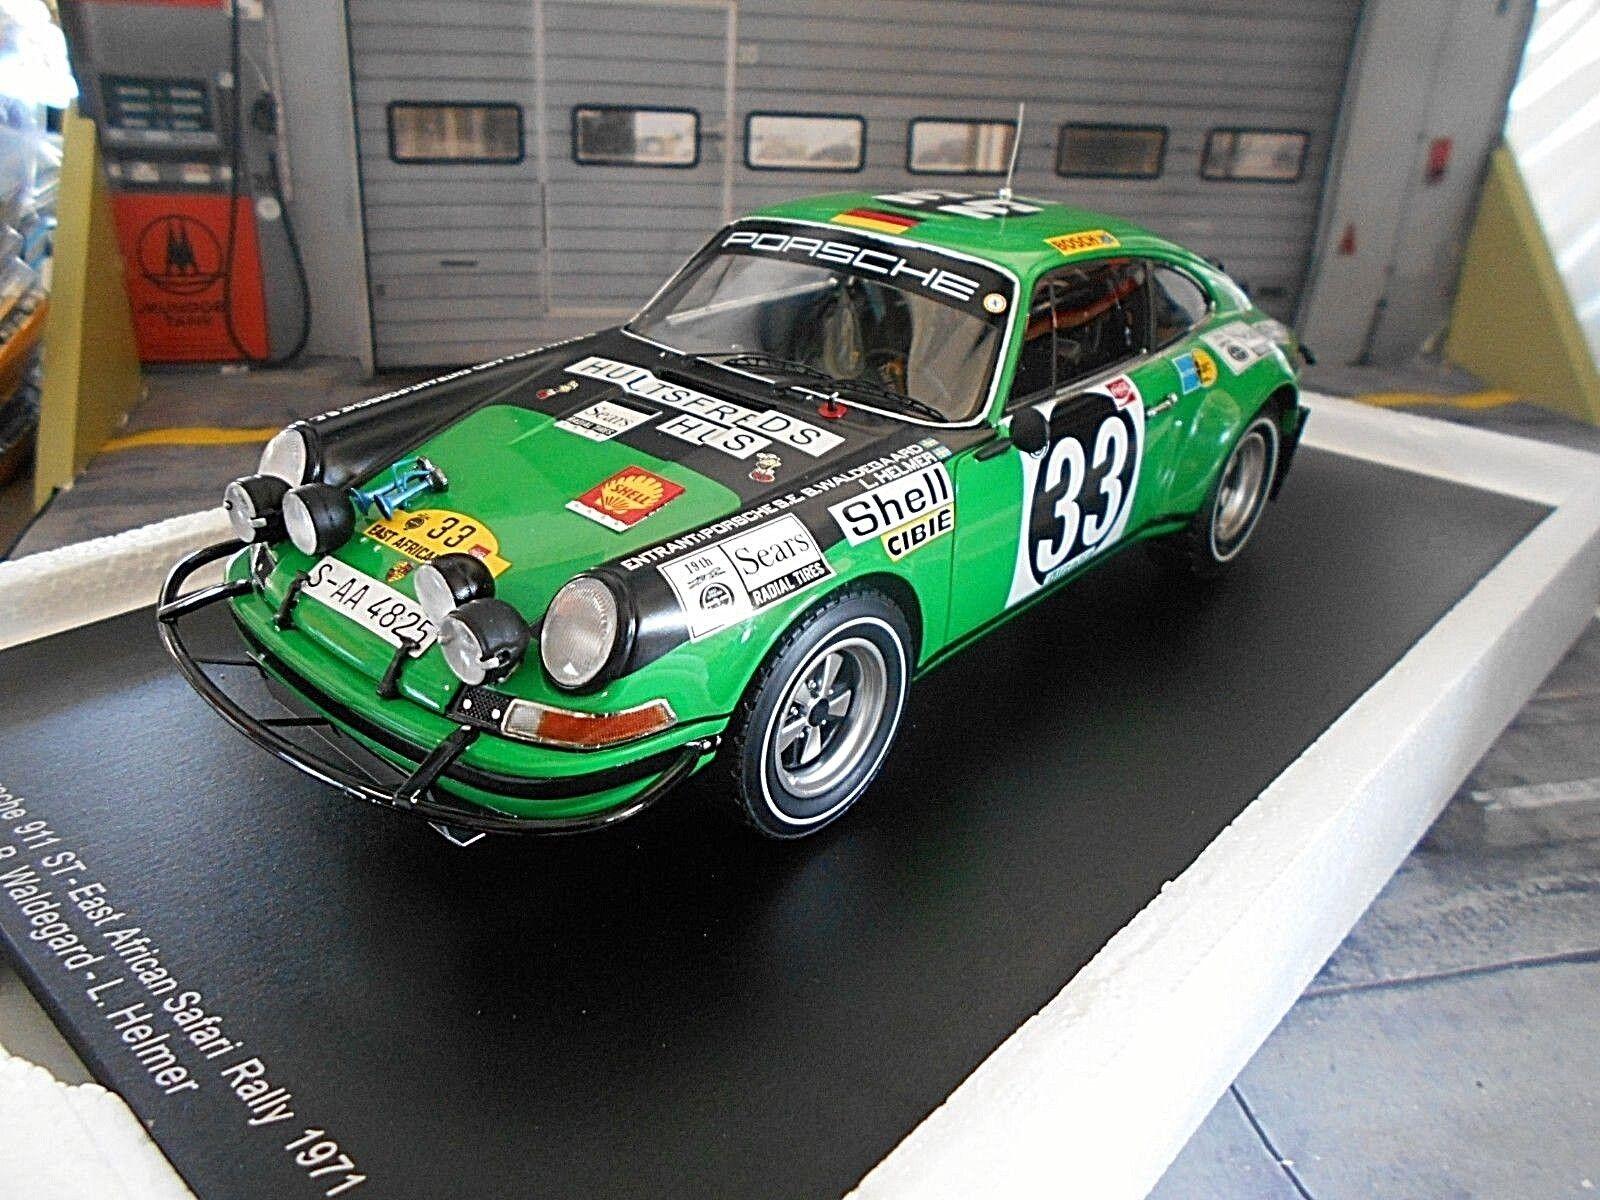 Porsche 911 S ST RALLYE SAFARI SAFARI SAFARI 1971 #33 Waldegaard Shell Spark Resin highe 1:18 | Perpignan  226cef